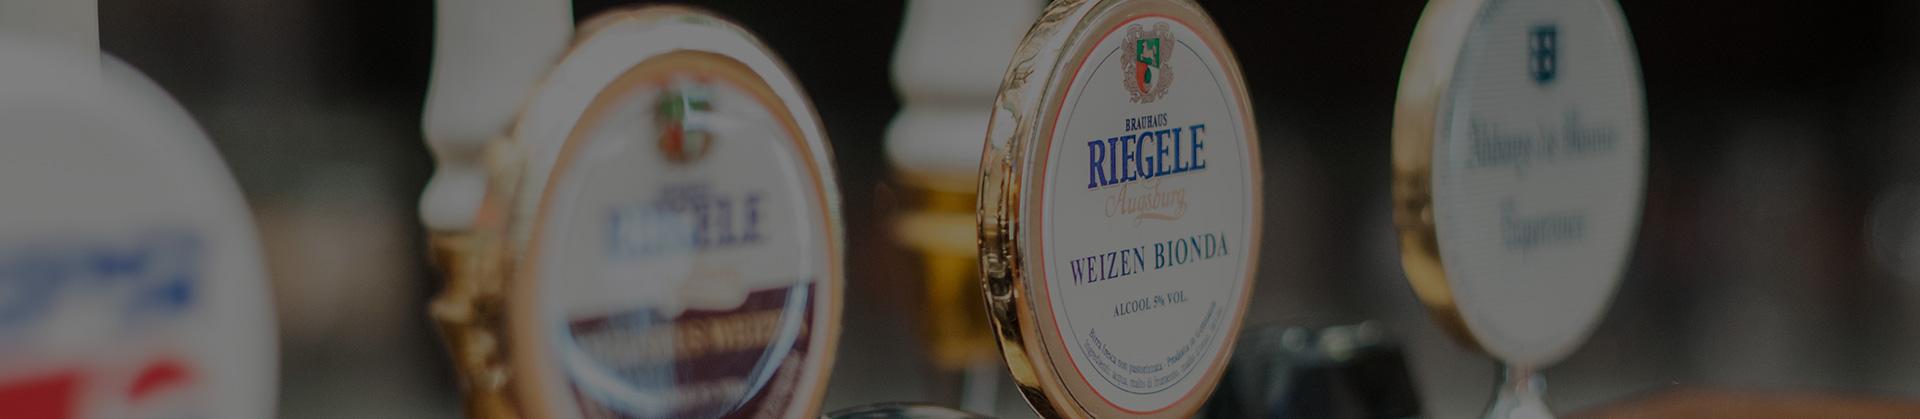 Birra alla spina Riegele e Bonne Esperance